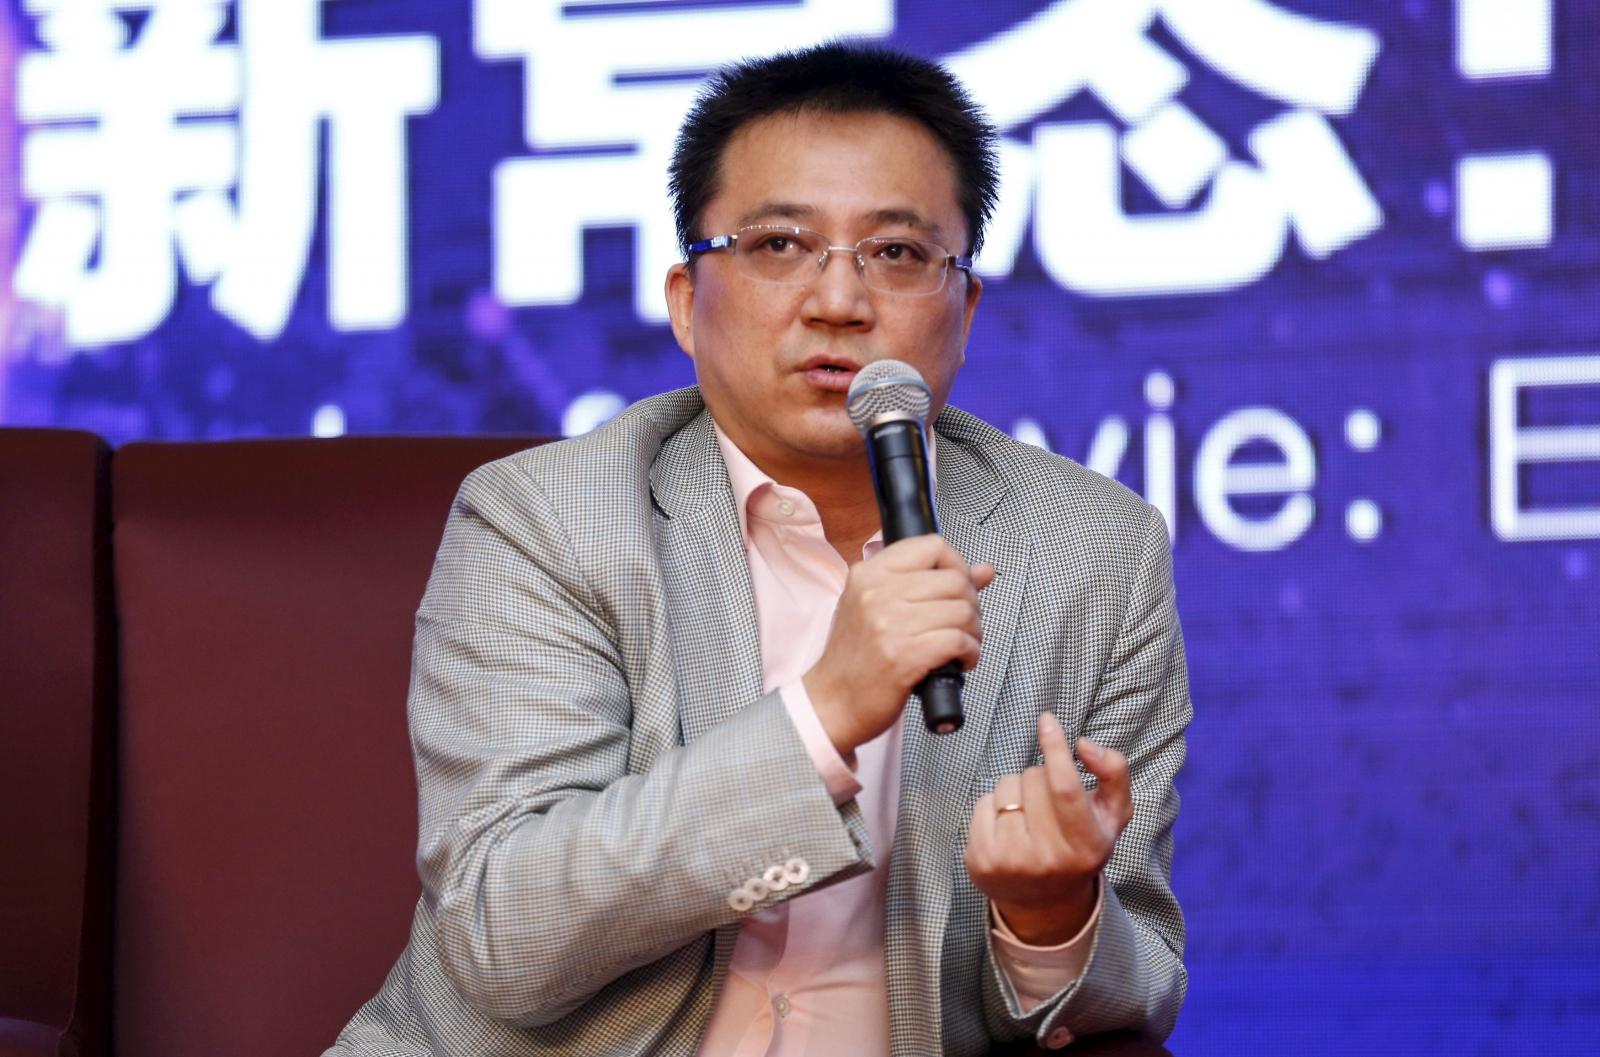 Patrick Liu